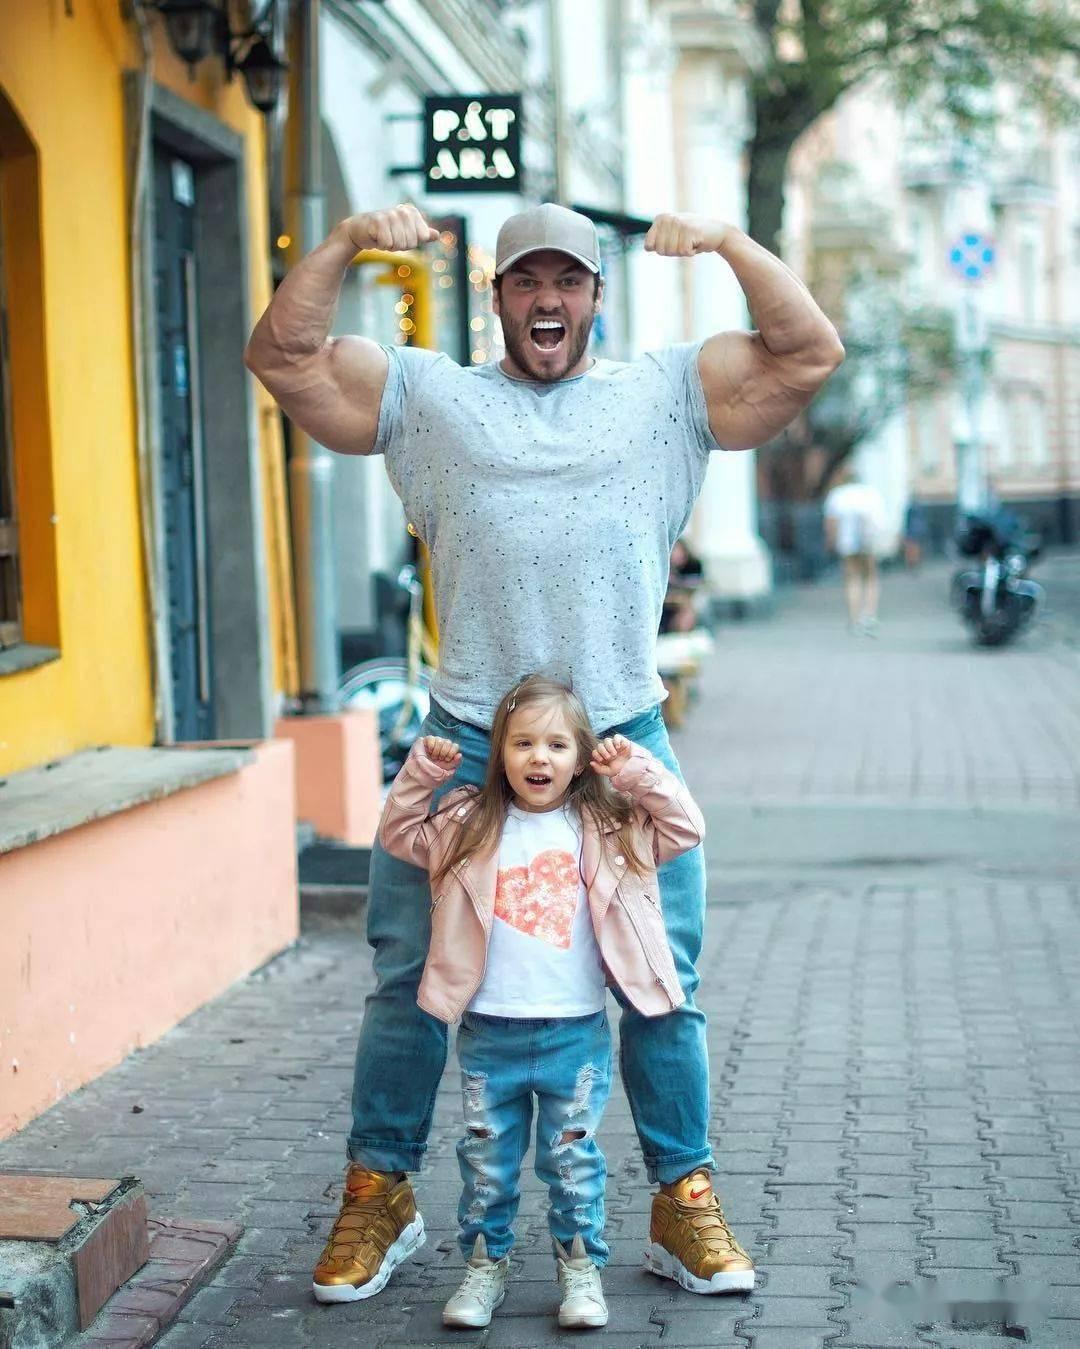 55cm臂围的肌肉硬汉,看了他的奶爸日常,我都想生娃了 初级健身 第14张